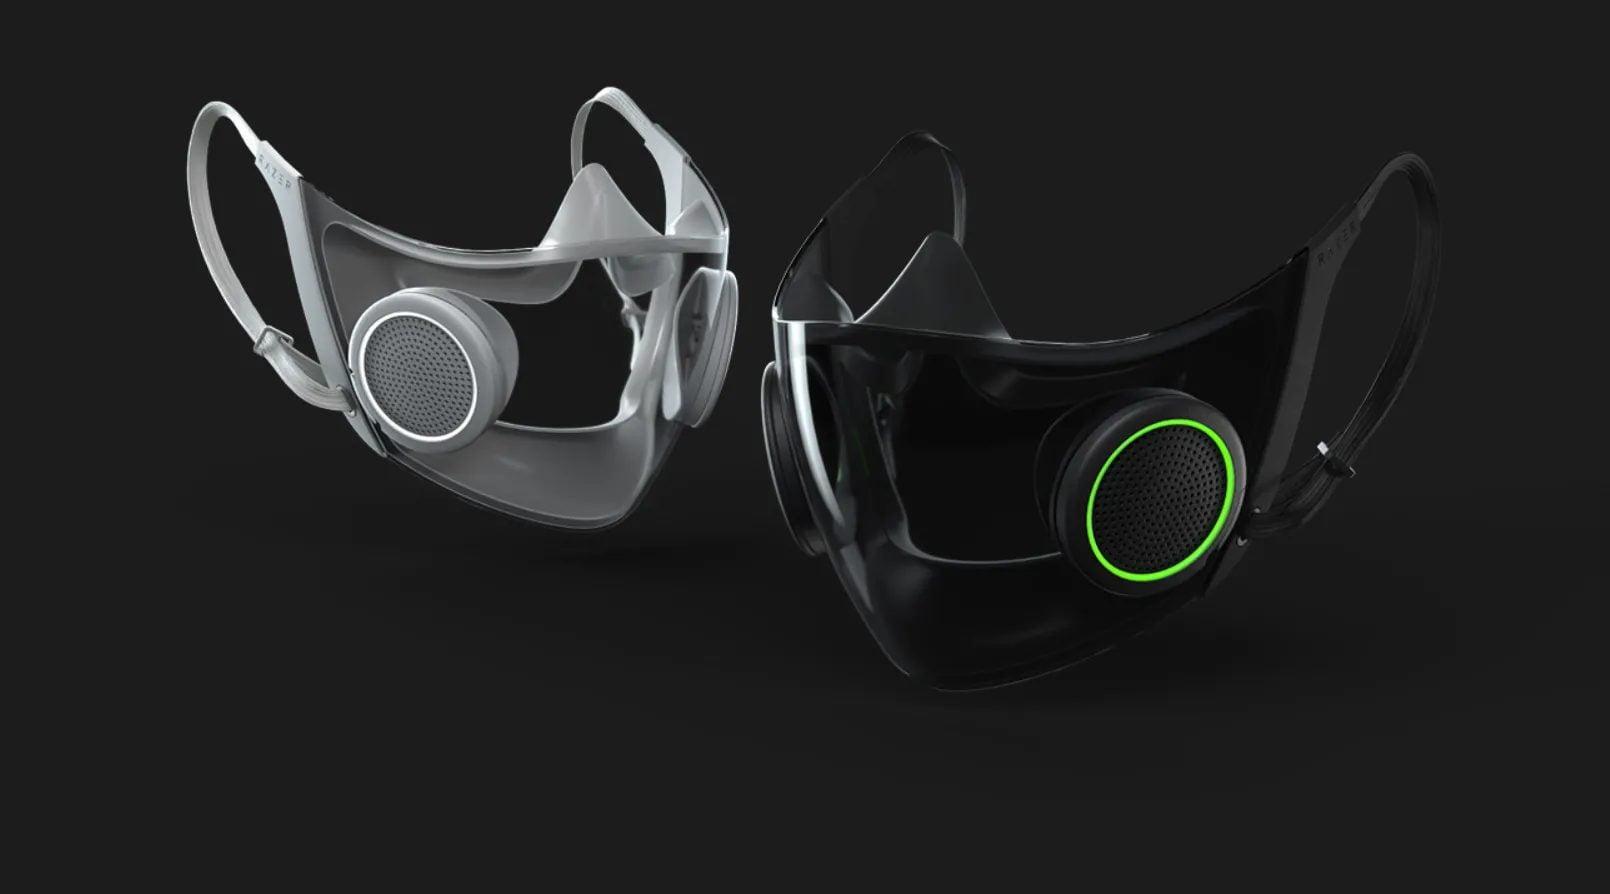 razer n95, smart mask razer, rgb mask